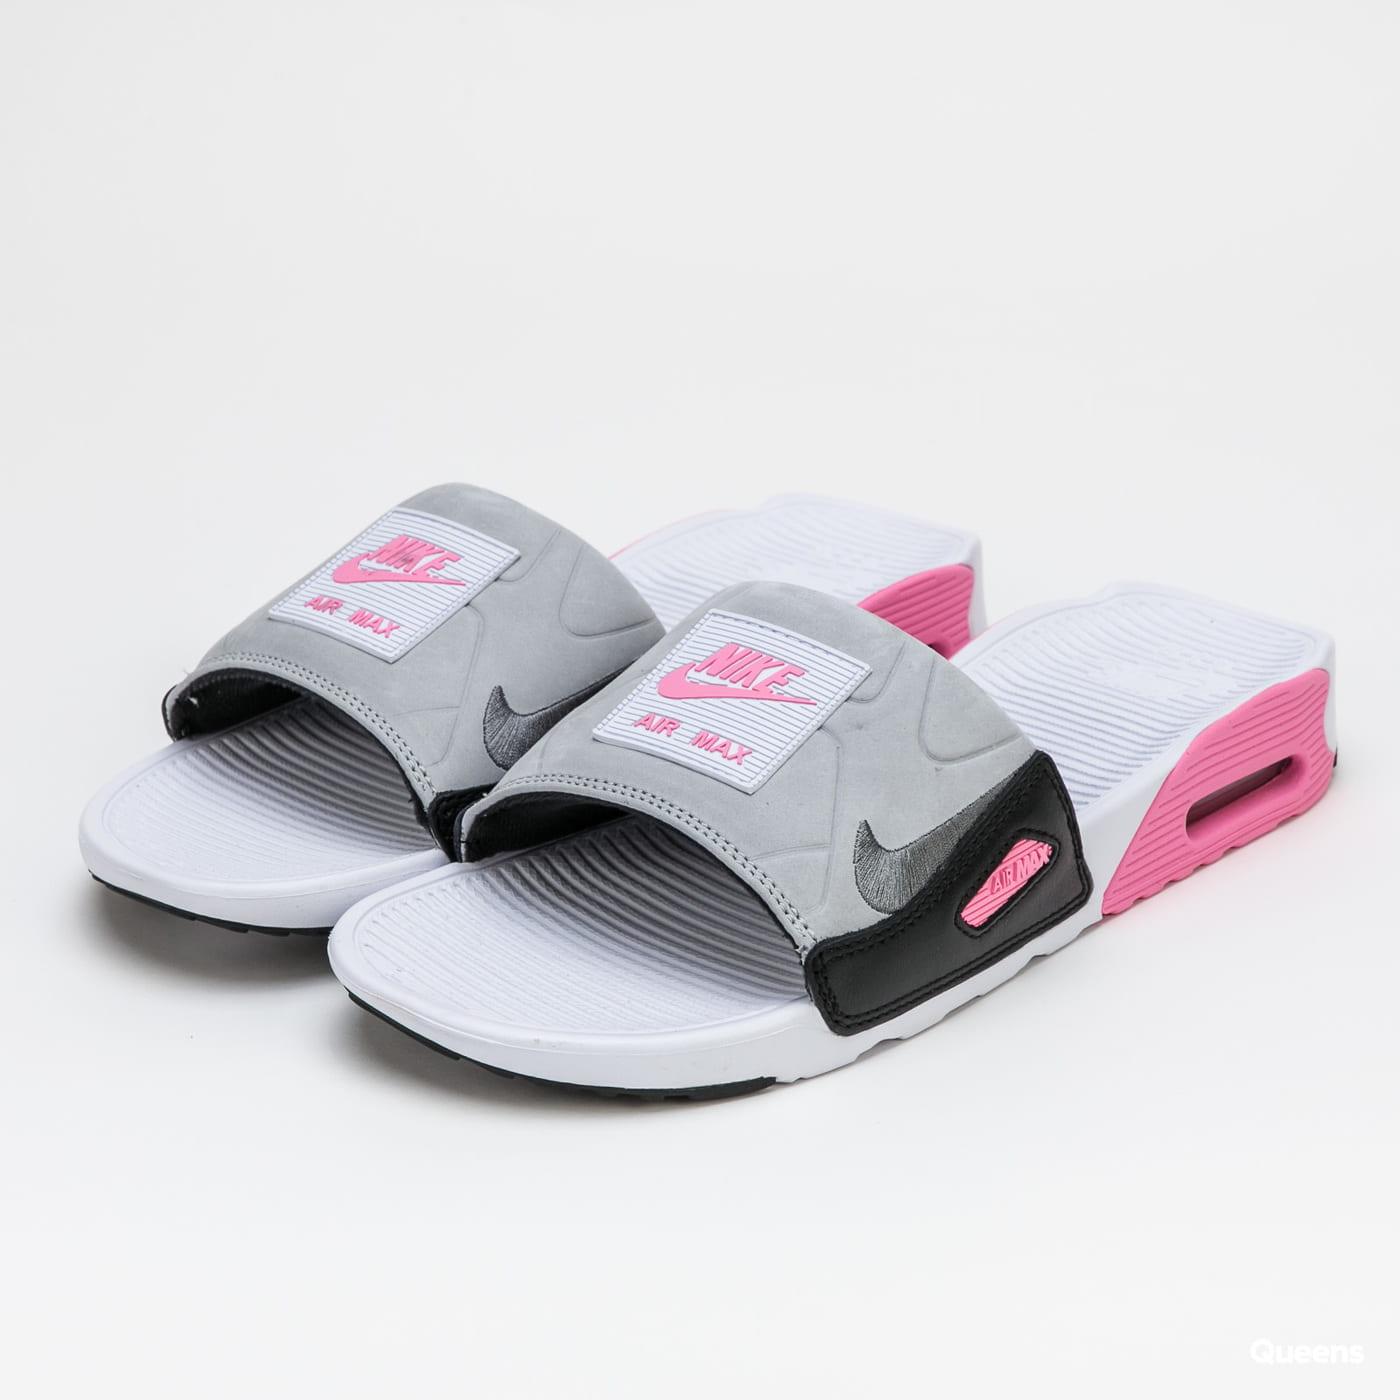 air max 90 slide rose et gris